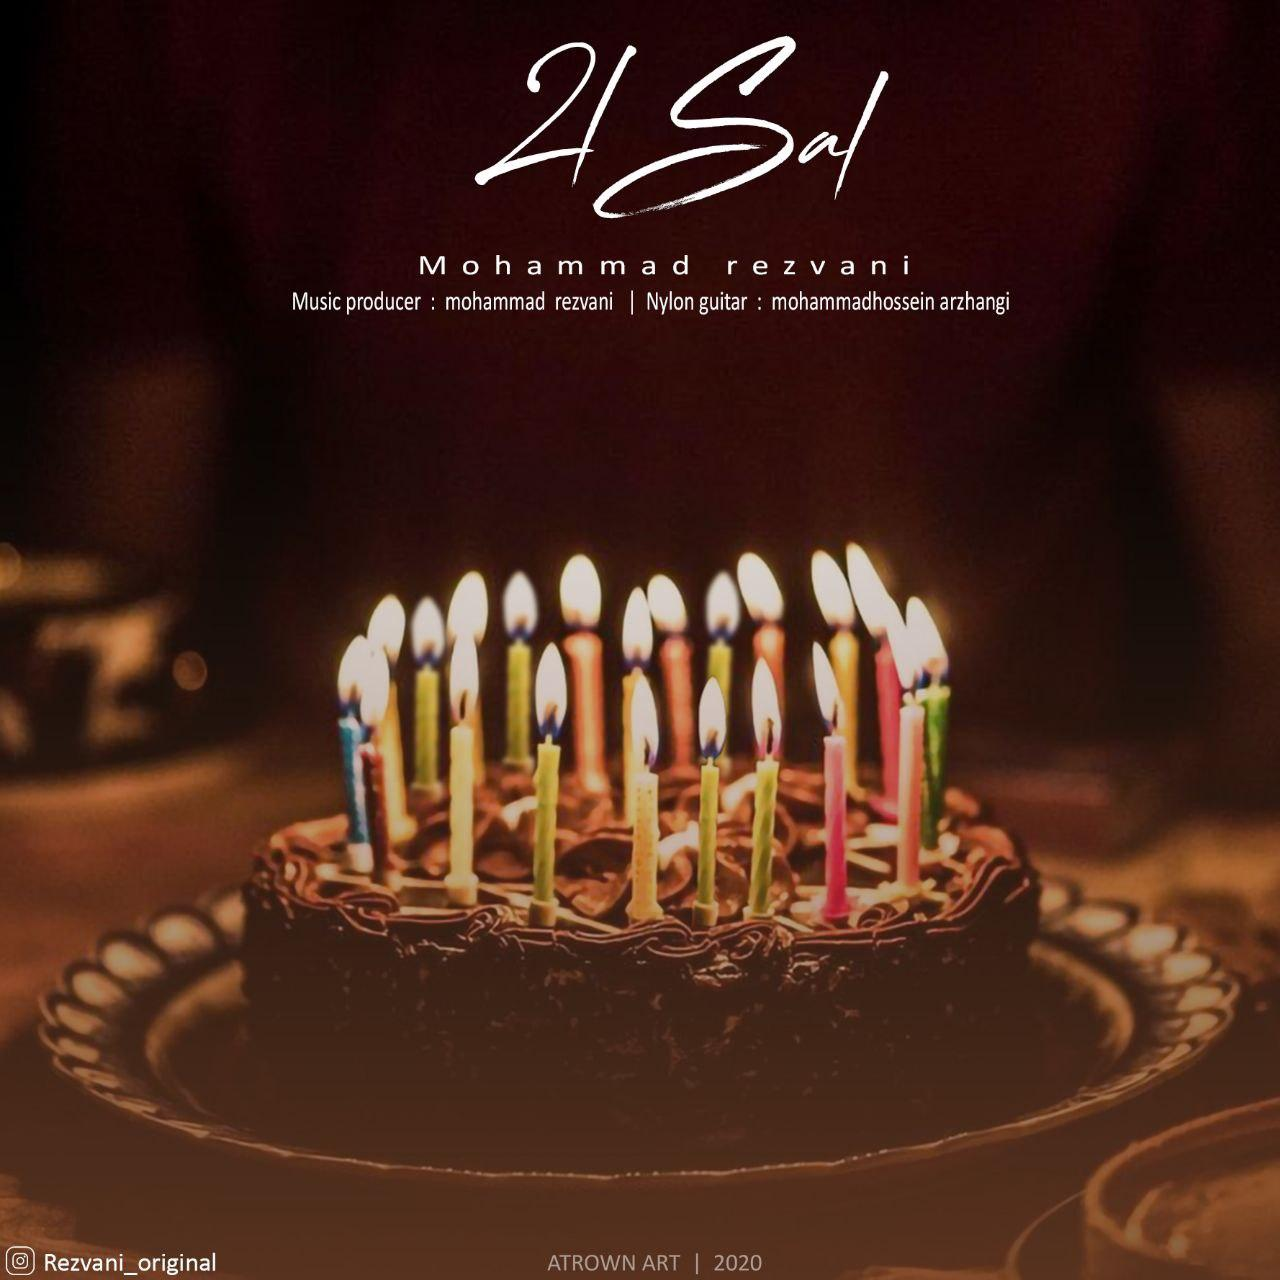 Mohammad Rezvani – 21Sal